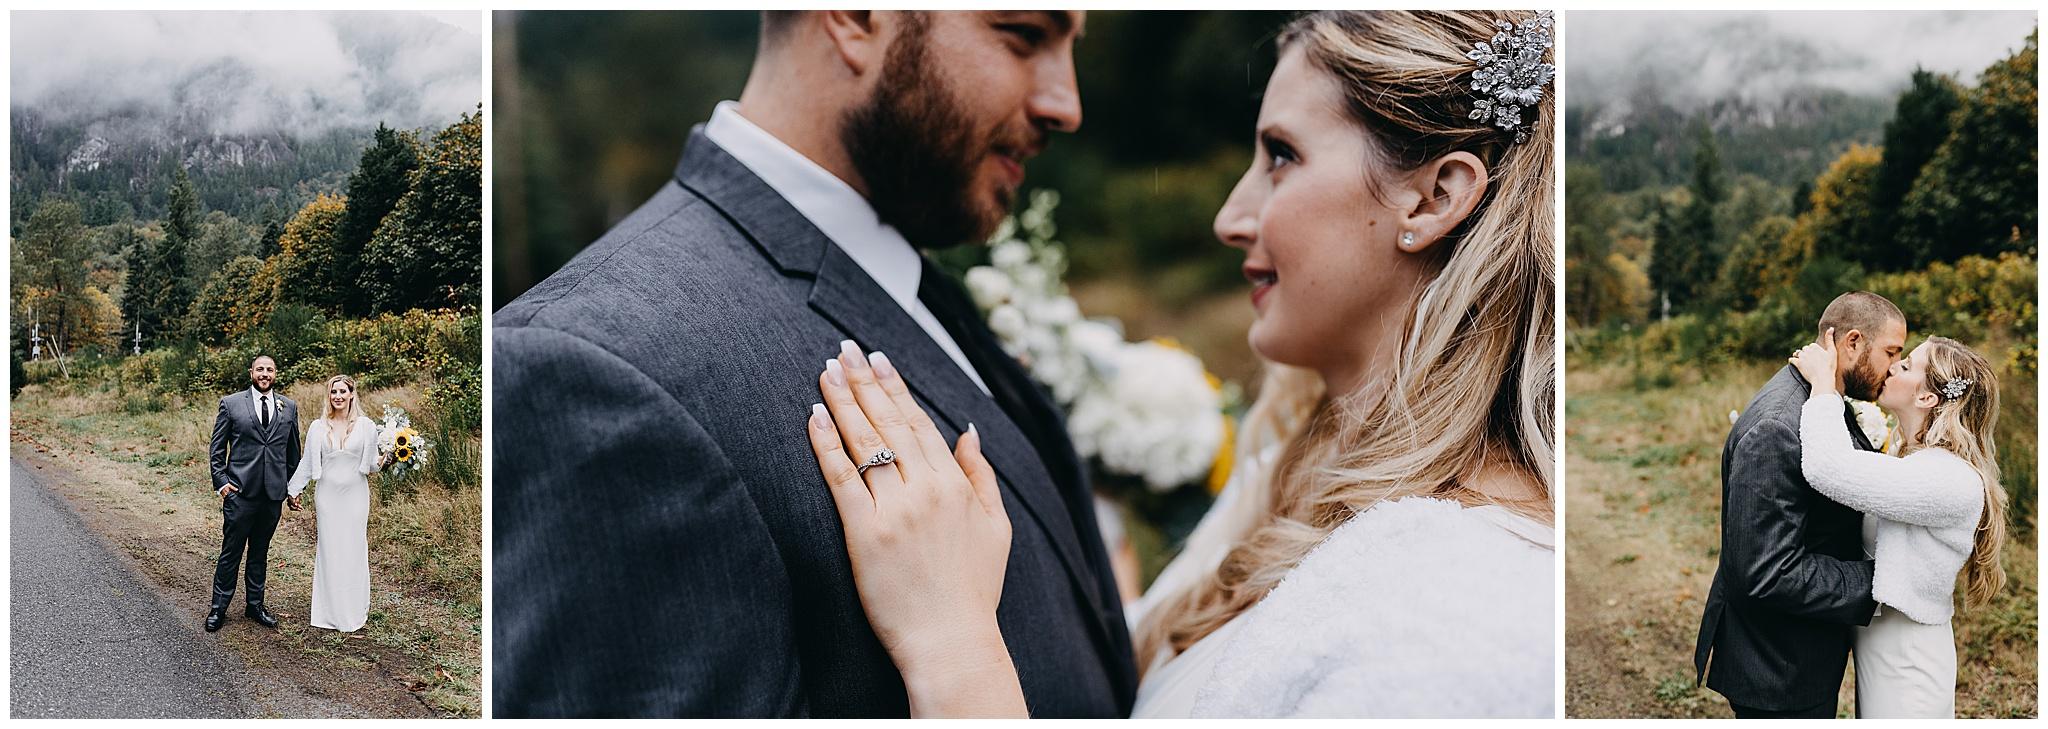 index-wa-wedding71.jpg